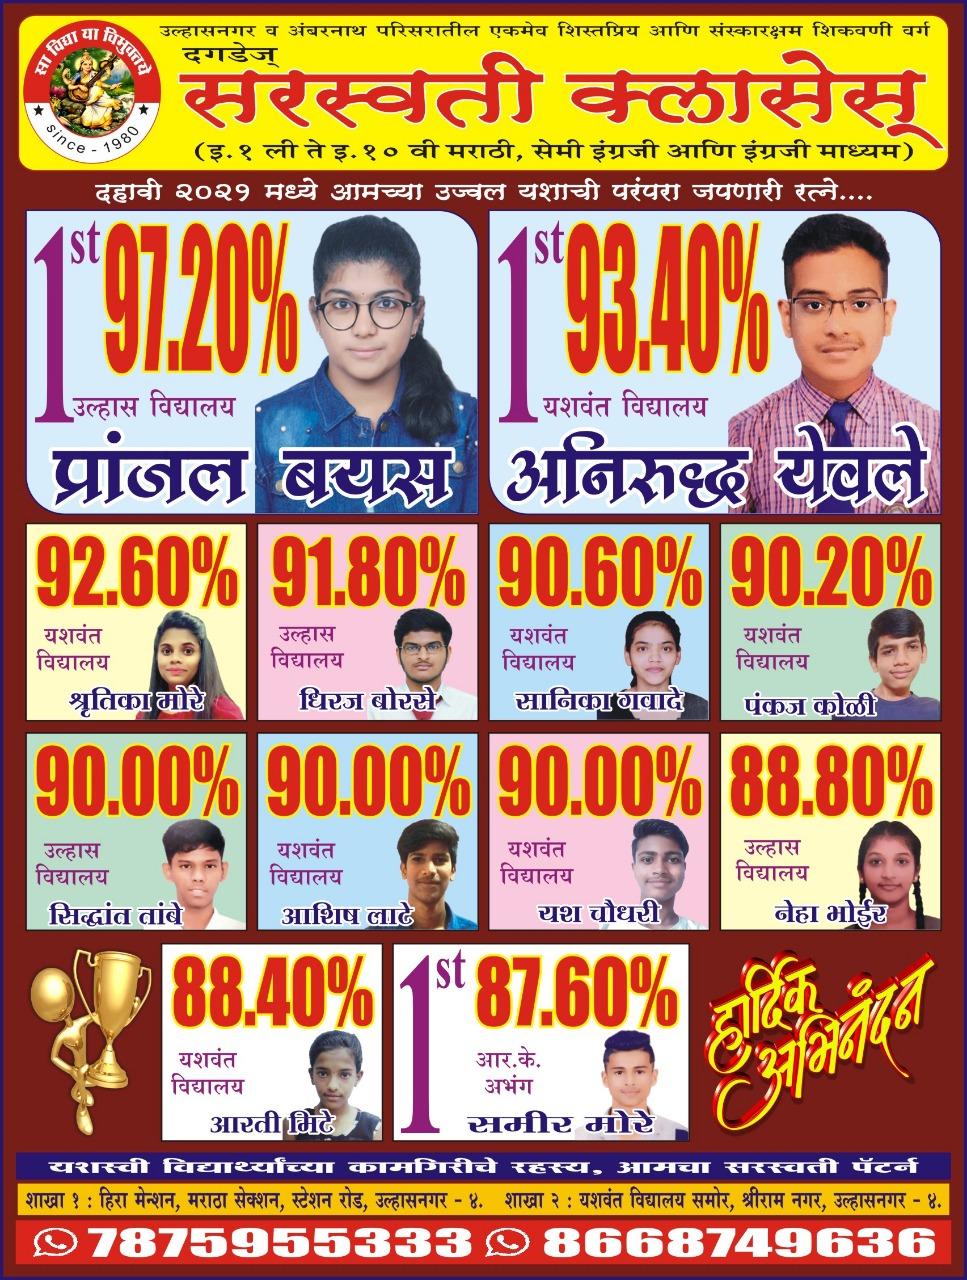 Saraswati Classes Topper 2021